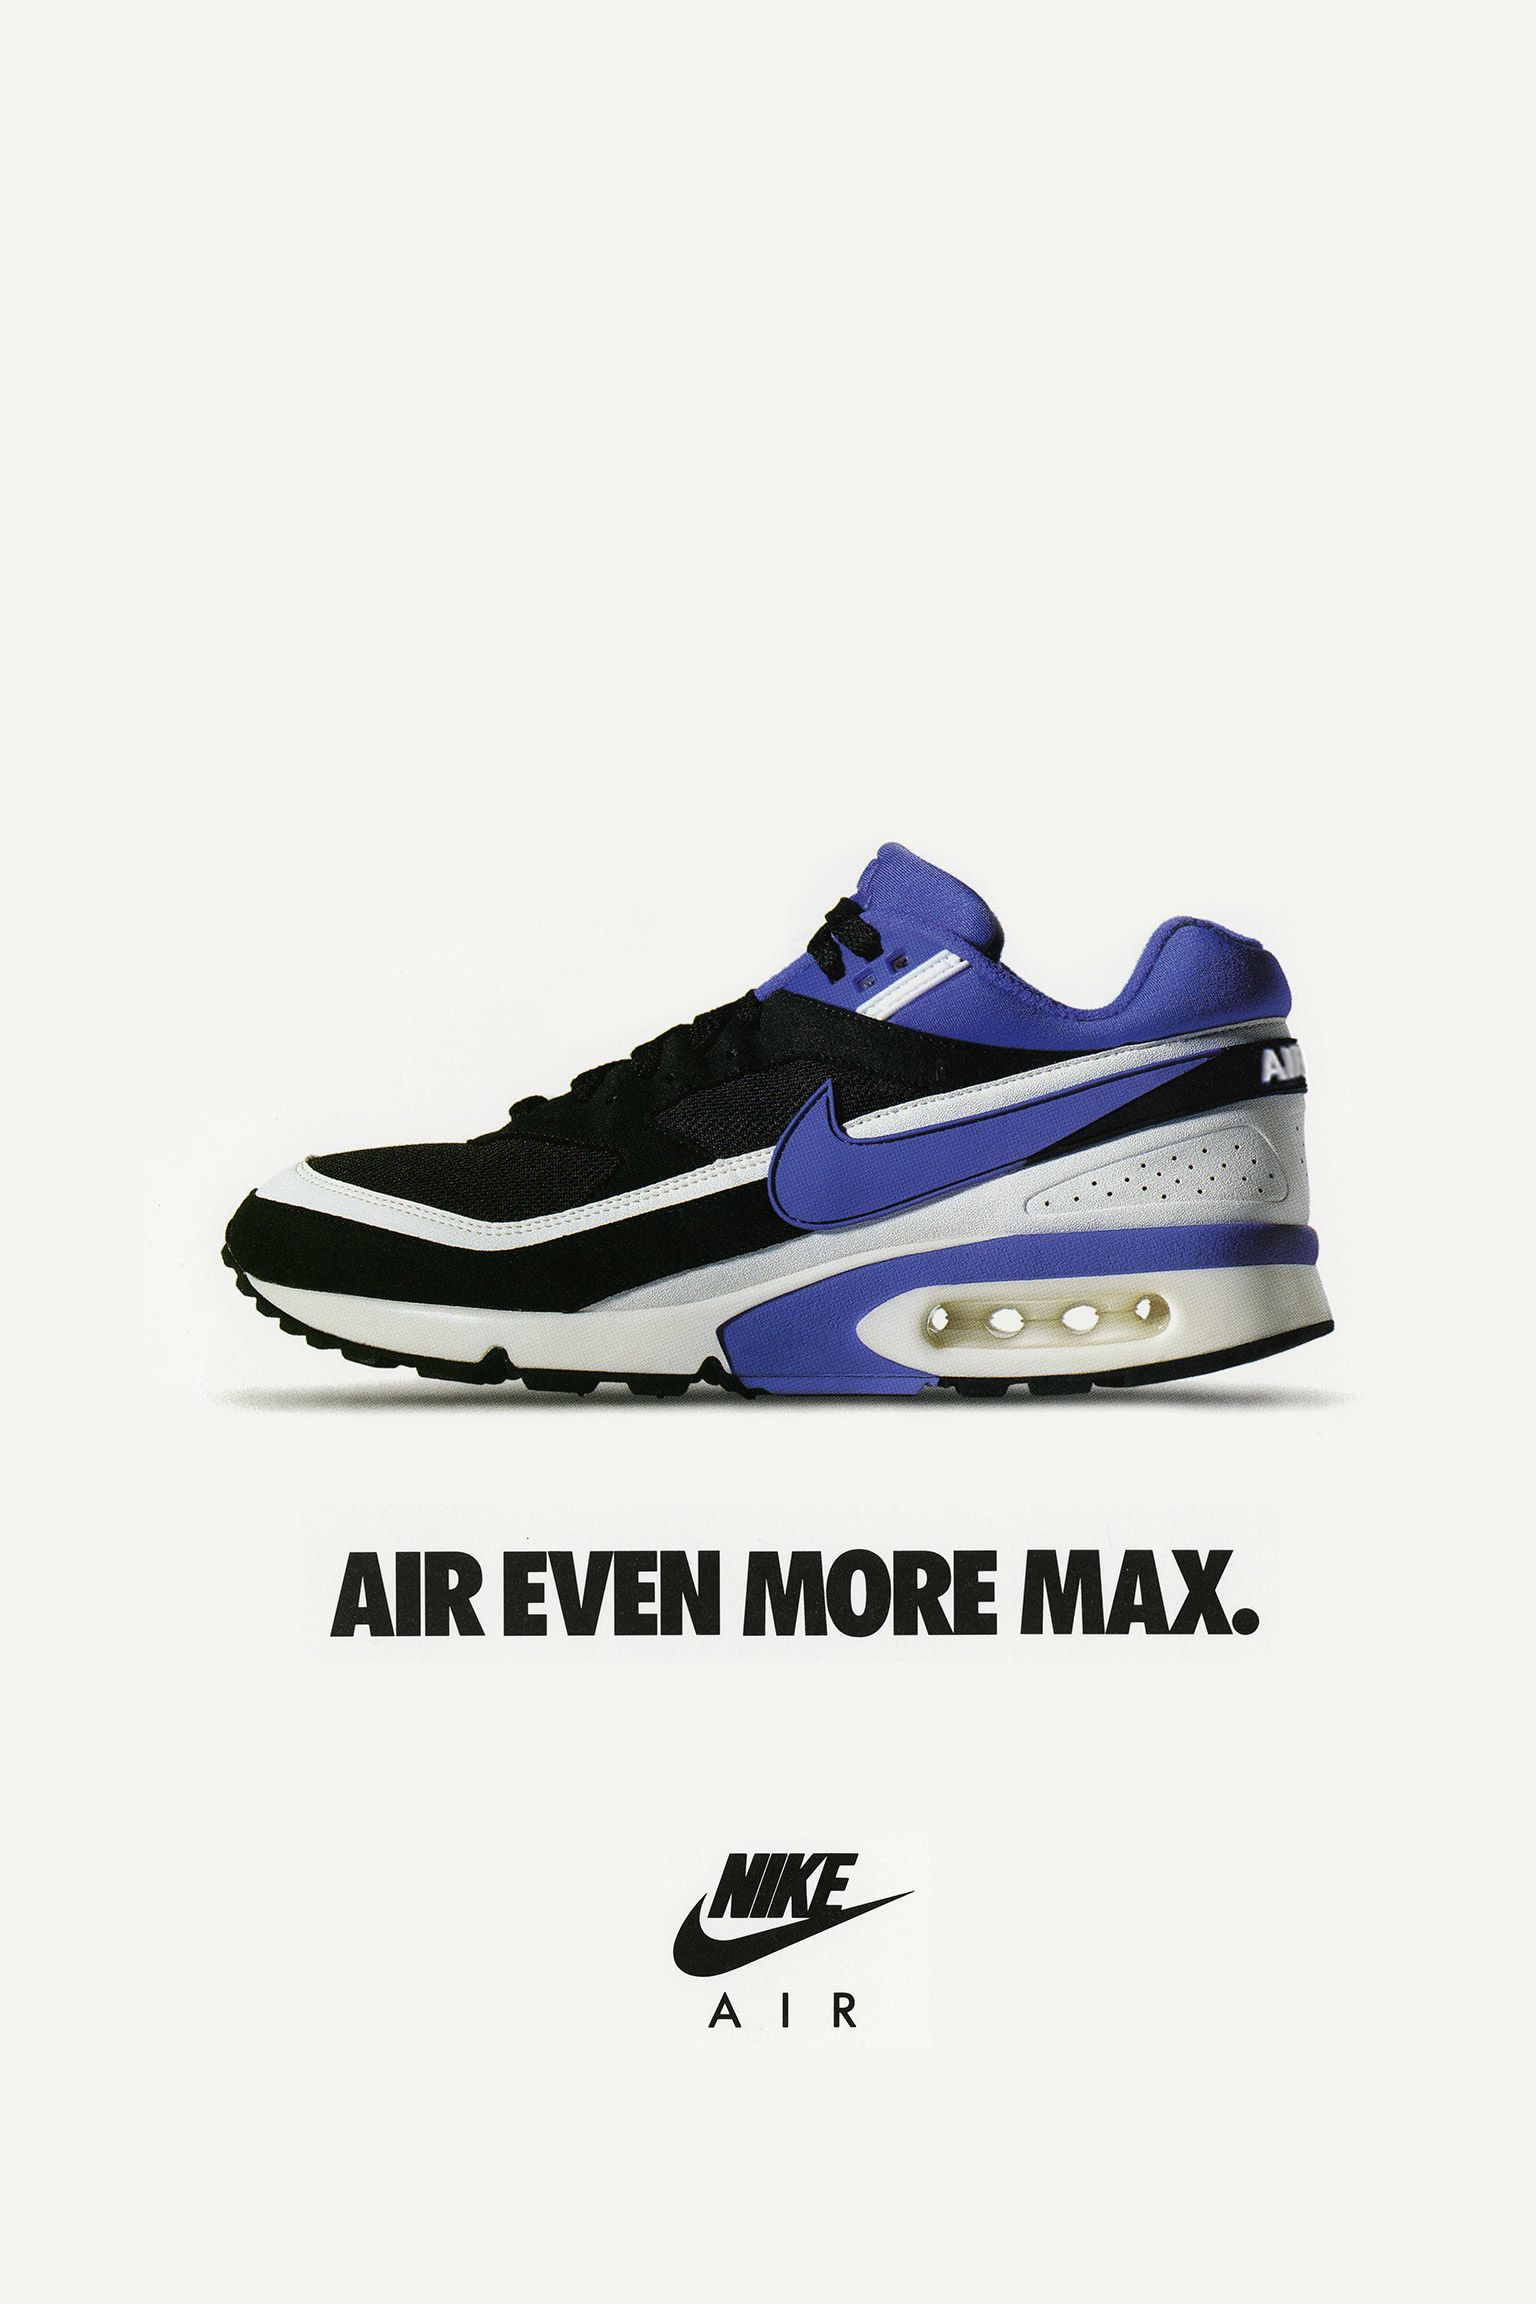 Inside the Vault: Nike Air Max BW 'Big Window'. Nike SNKRS GB